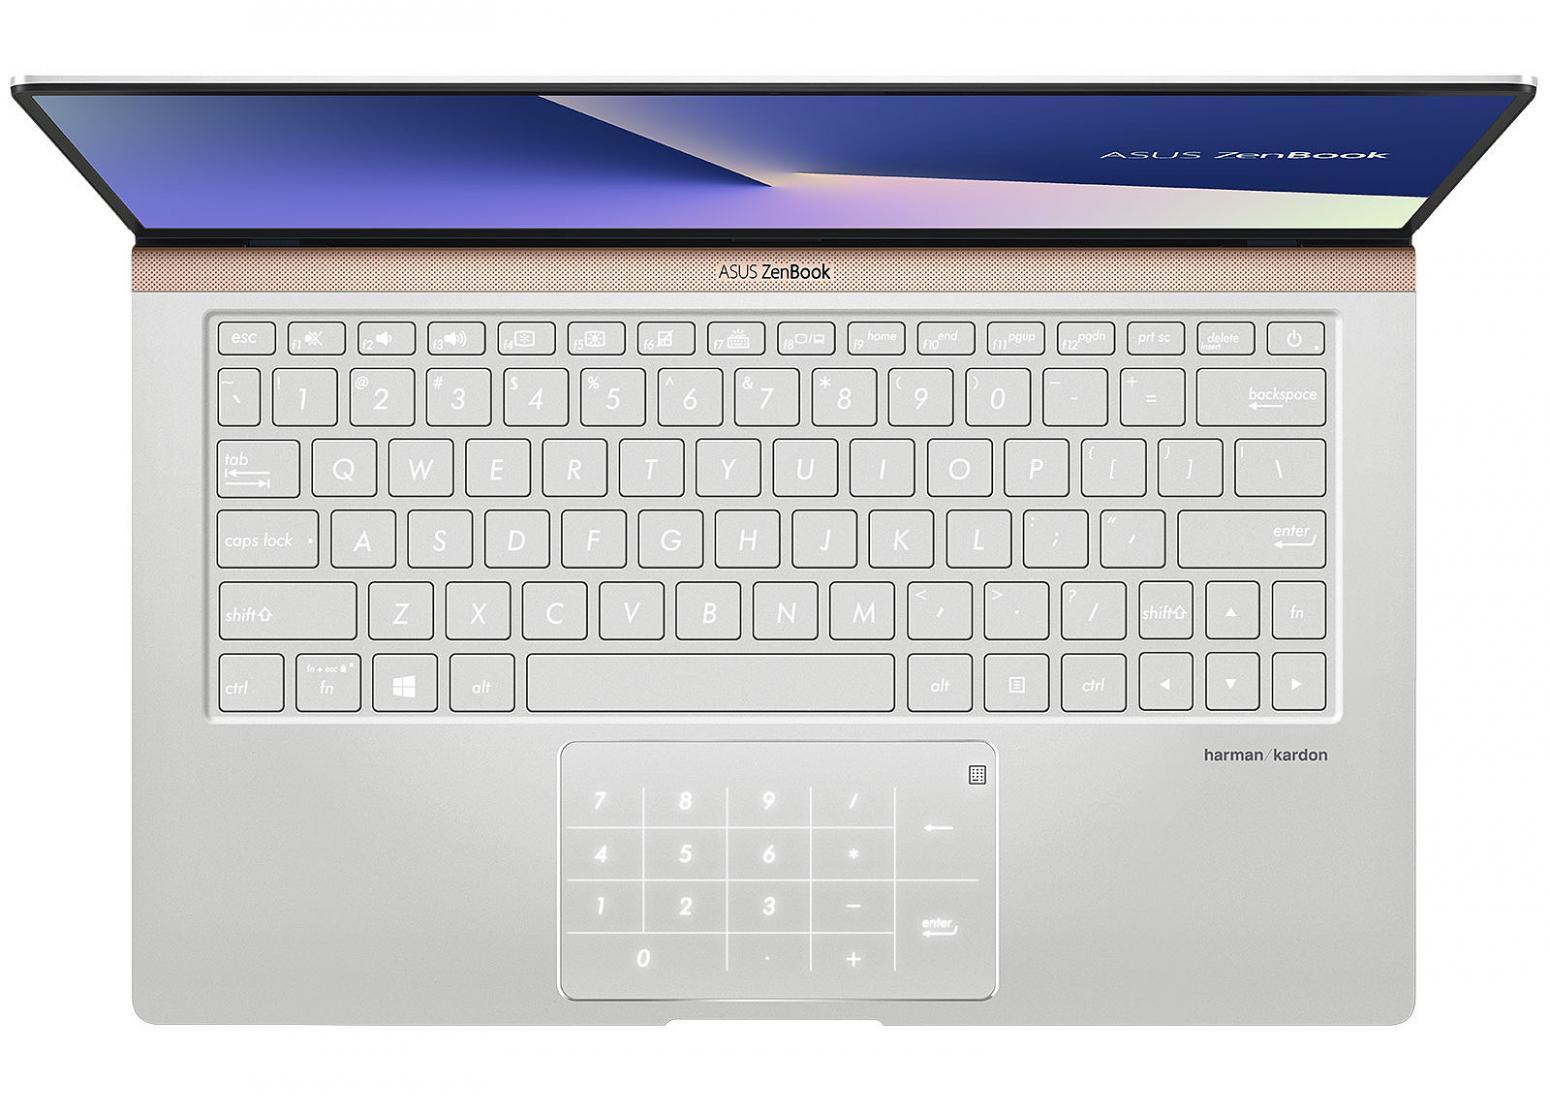 Ordinateur portable Asus Zenbook 13 UX333FA-A3112R Argent - NumPad, Pro - photo 3